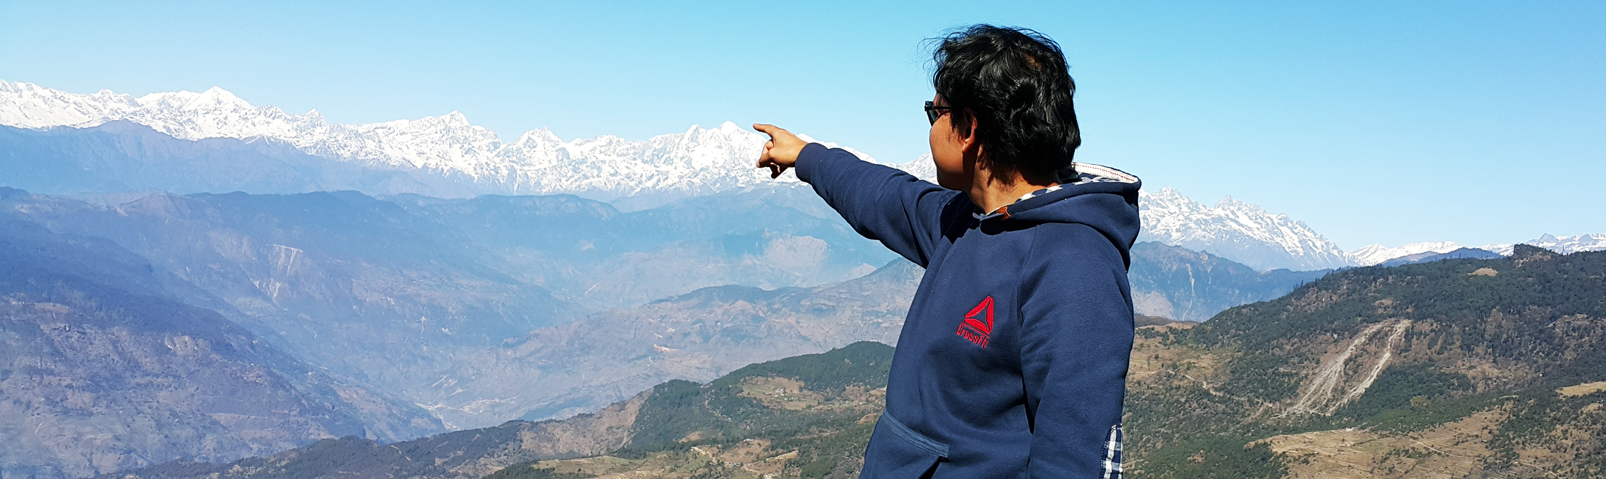 Near-to-Himalayas